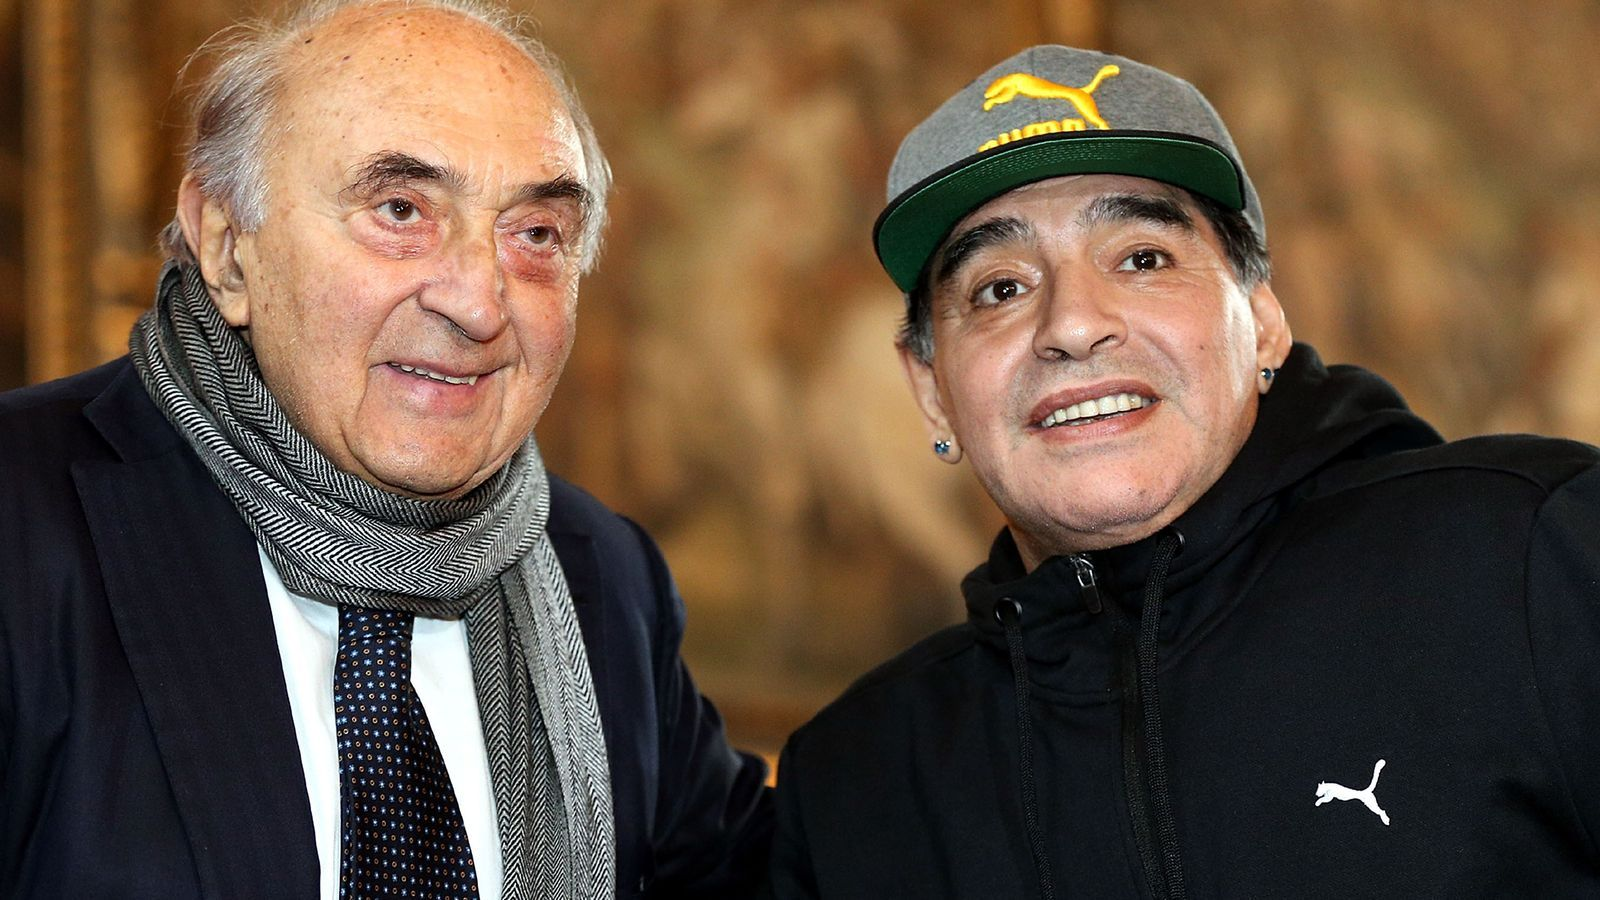 Corrado Ferlaino i Diego Armando Maradona durant la cerimònia del Saló de la fama de la Federació Italiana de Futbol el 2017